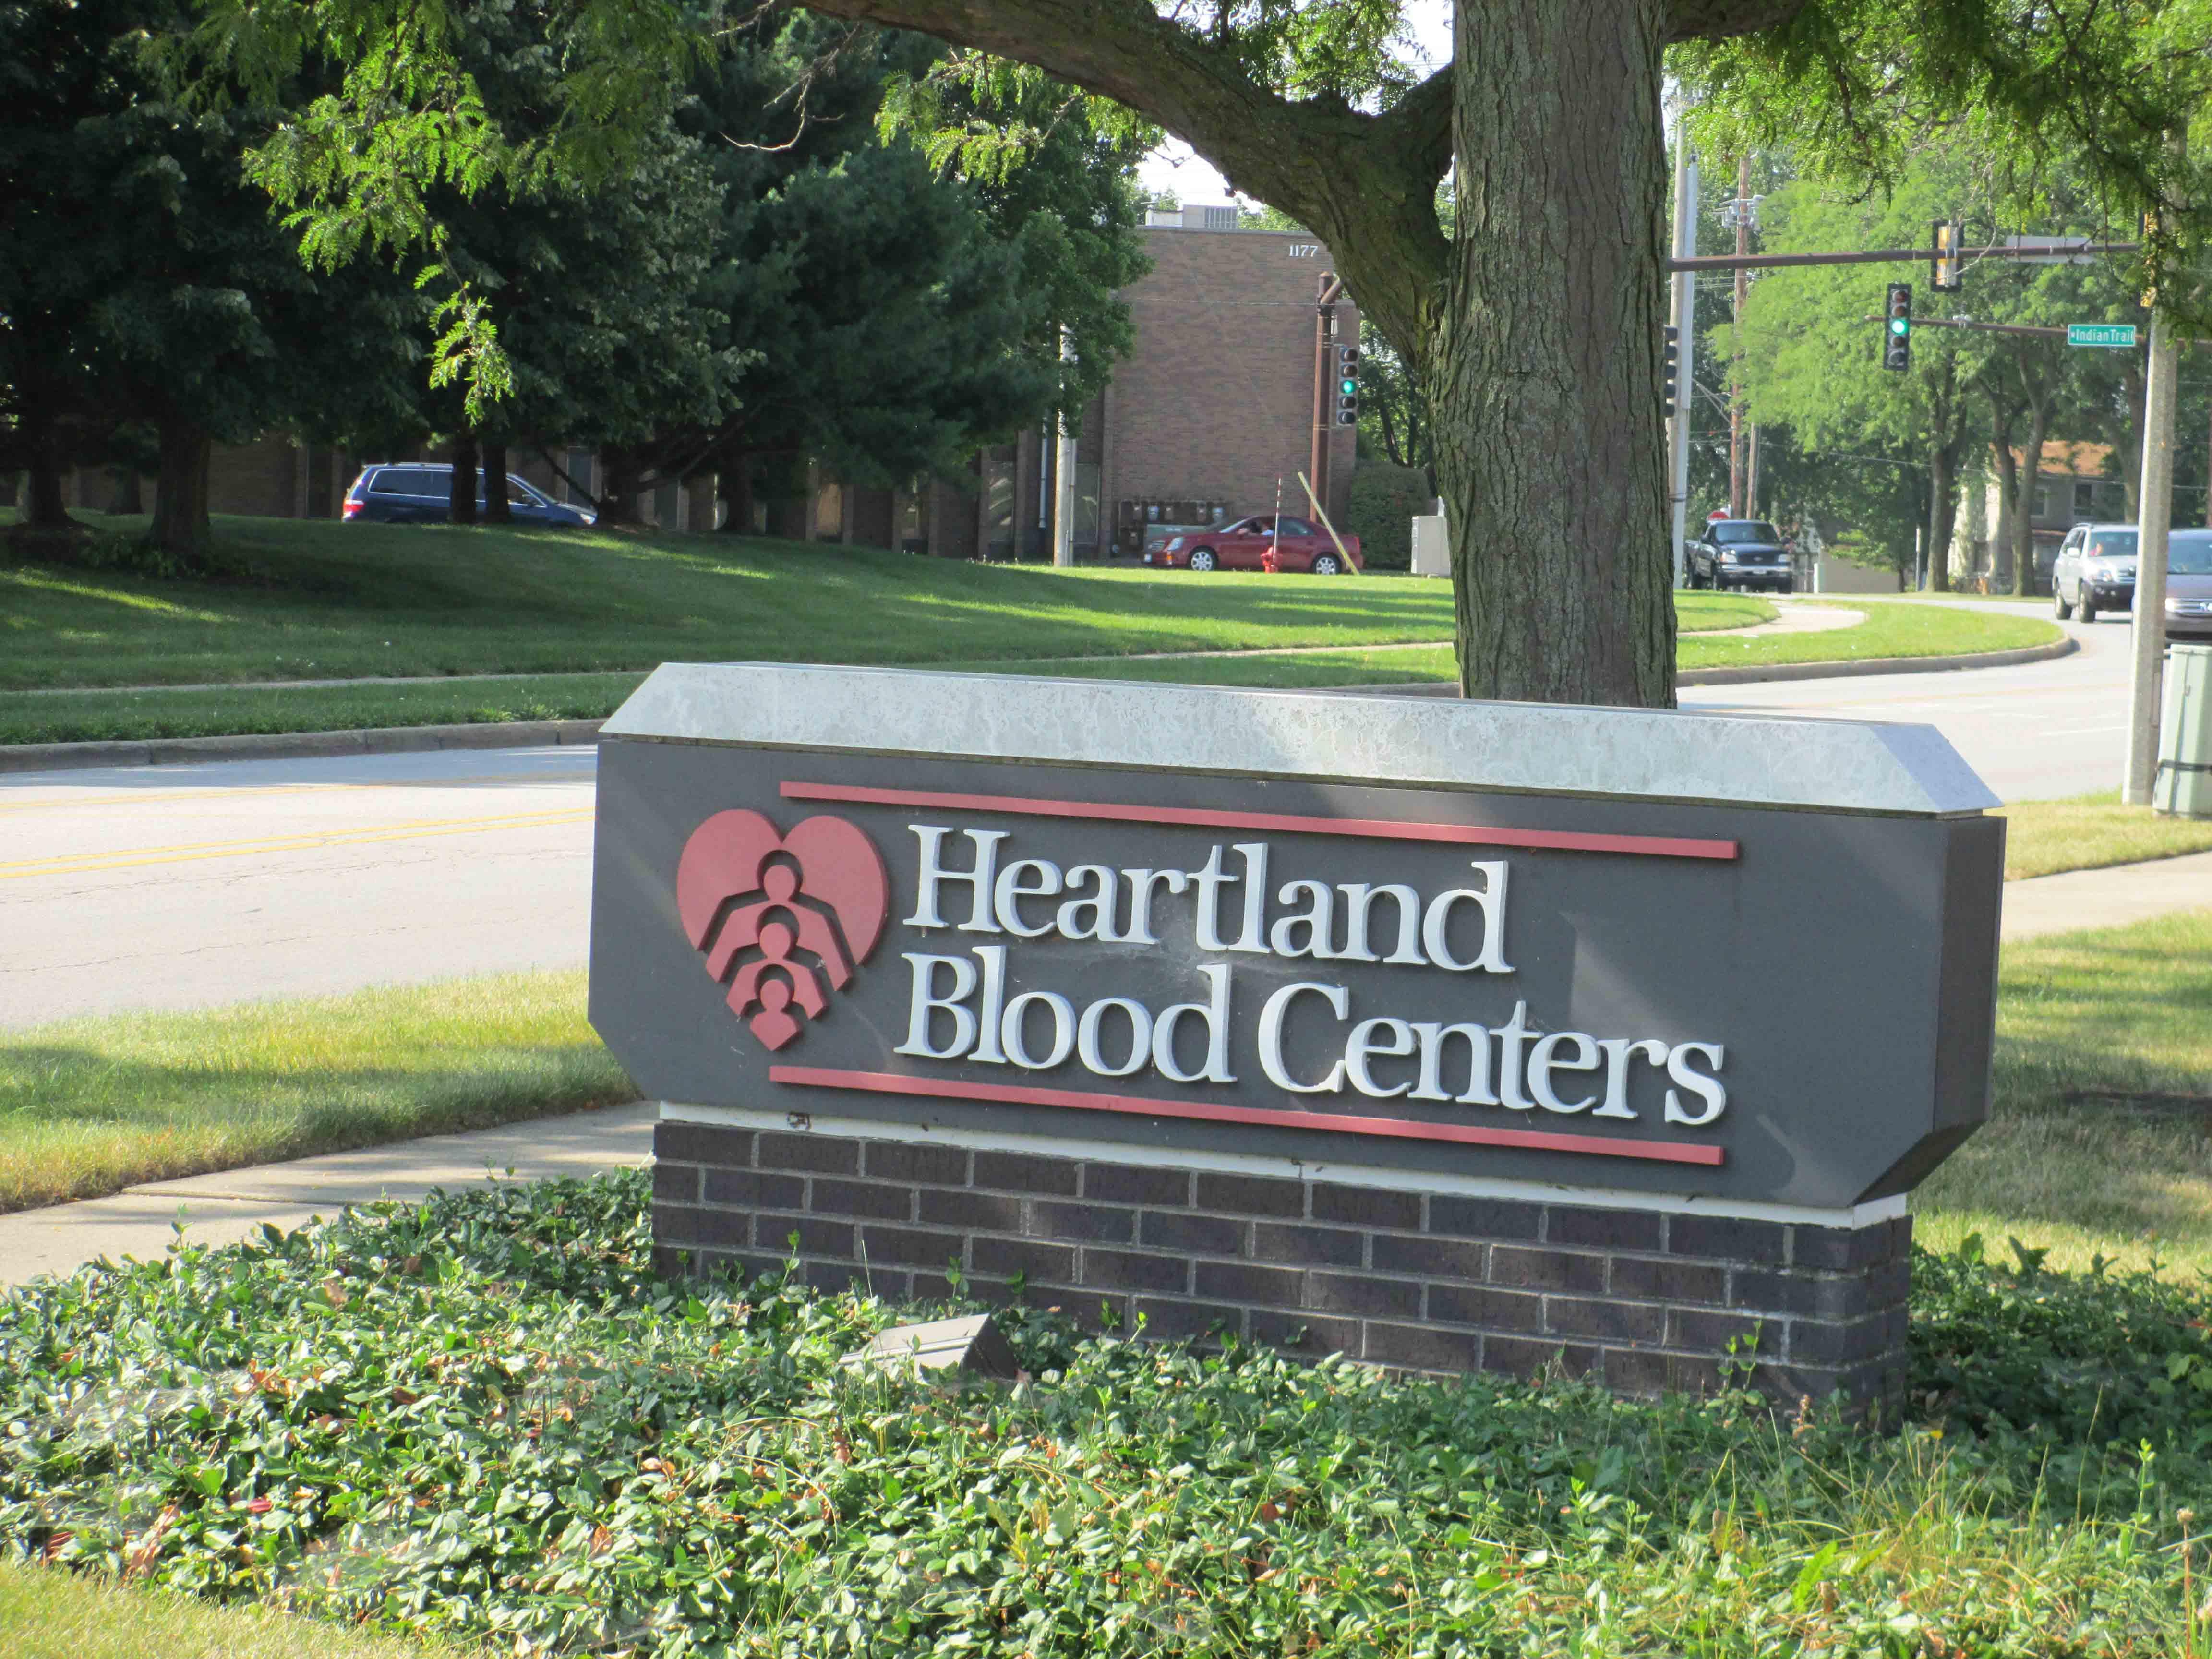 Heartland Blood Center St. Charles IL